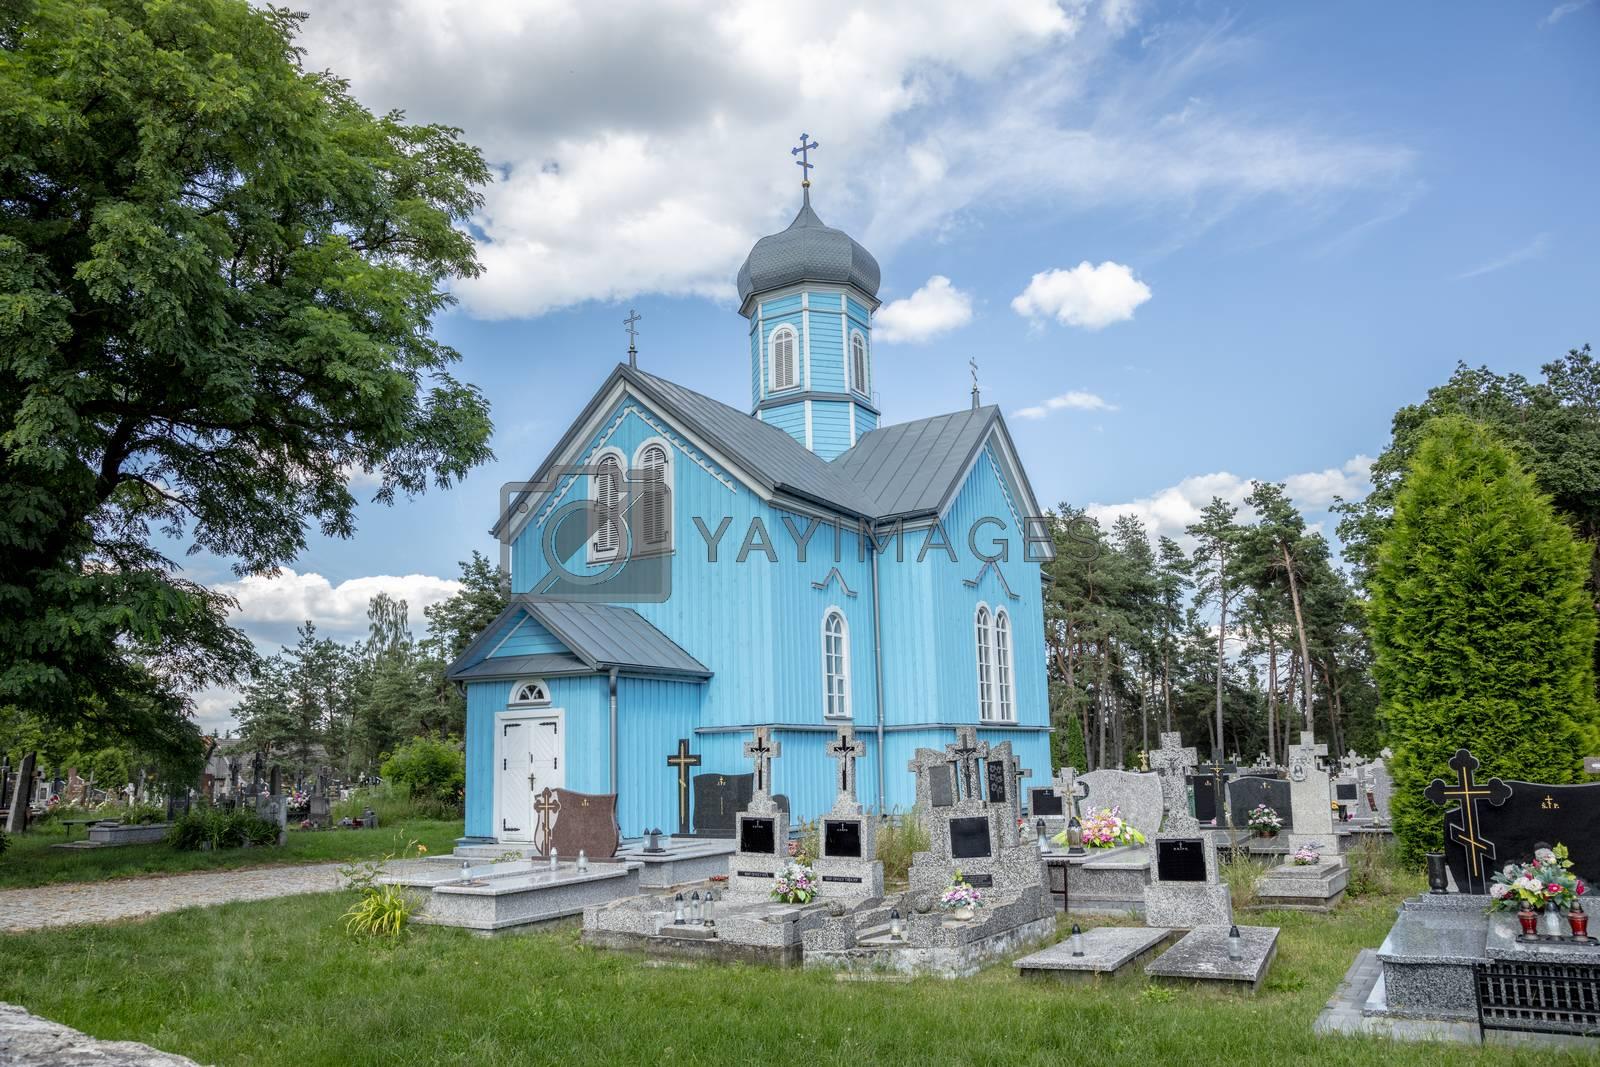 Saint George Orthodox church in Ryboly, a village in the Podlaskie Voivodeship, Poland